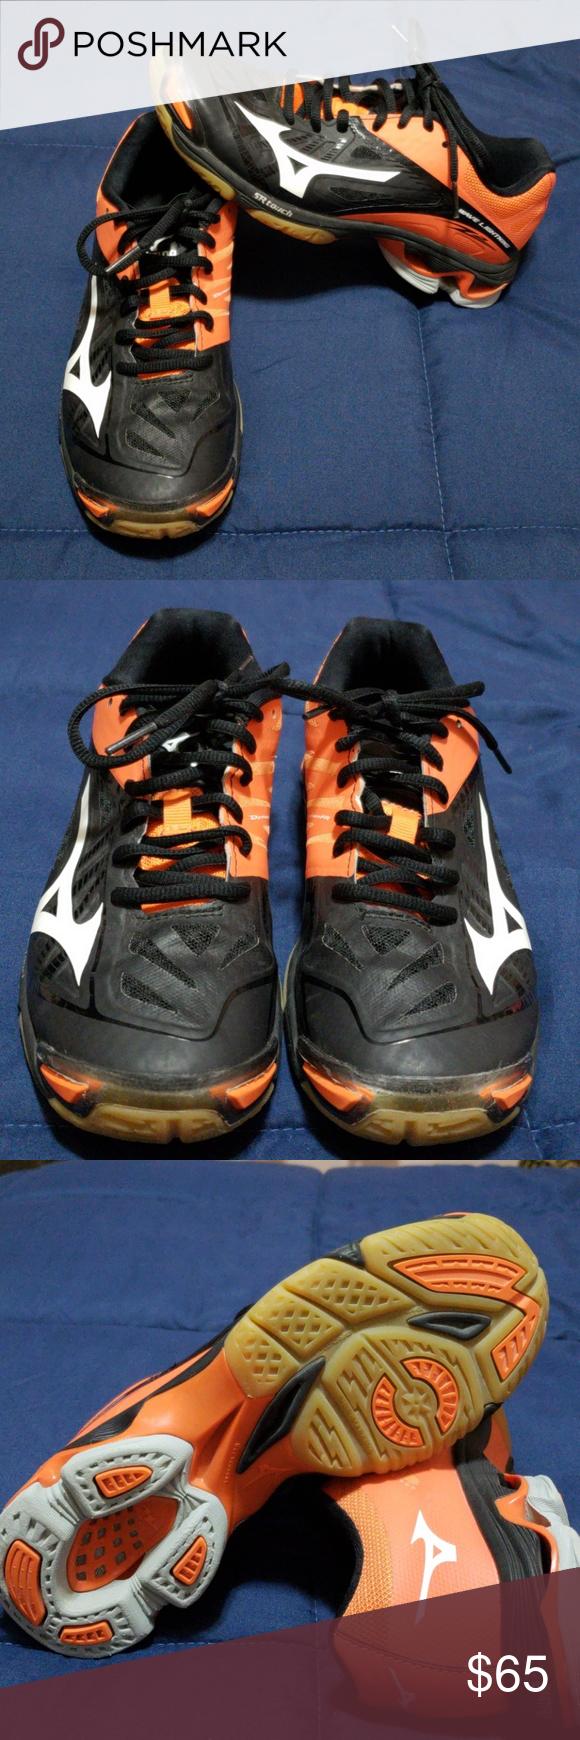 Mizuno Volleyball Shoes Volleyball Shoes Mizuno Shoes Mizuno Volleyball